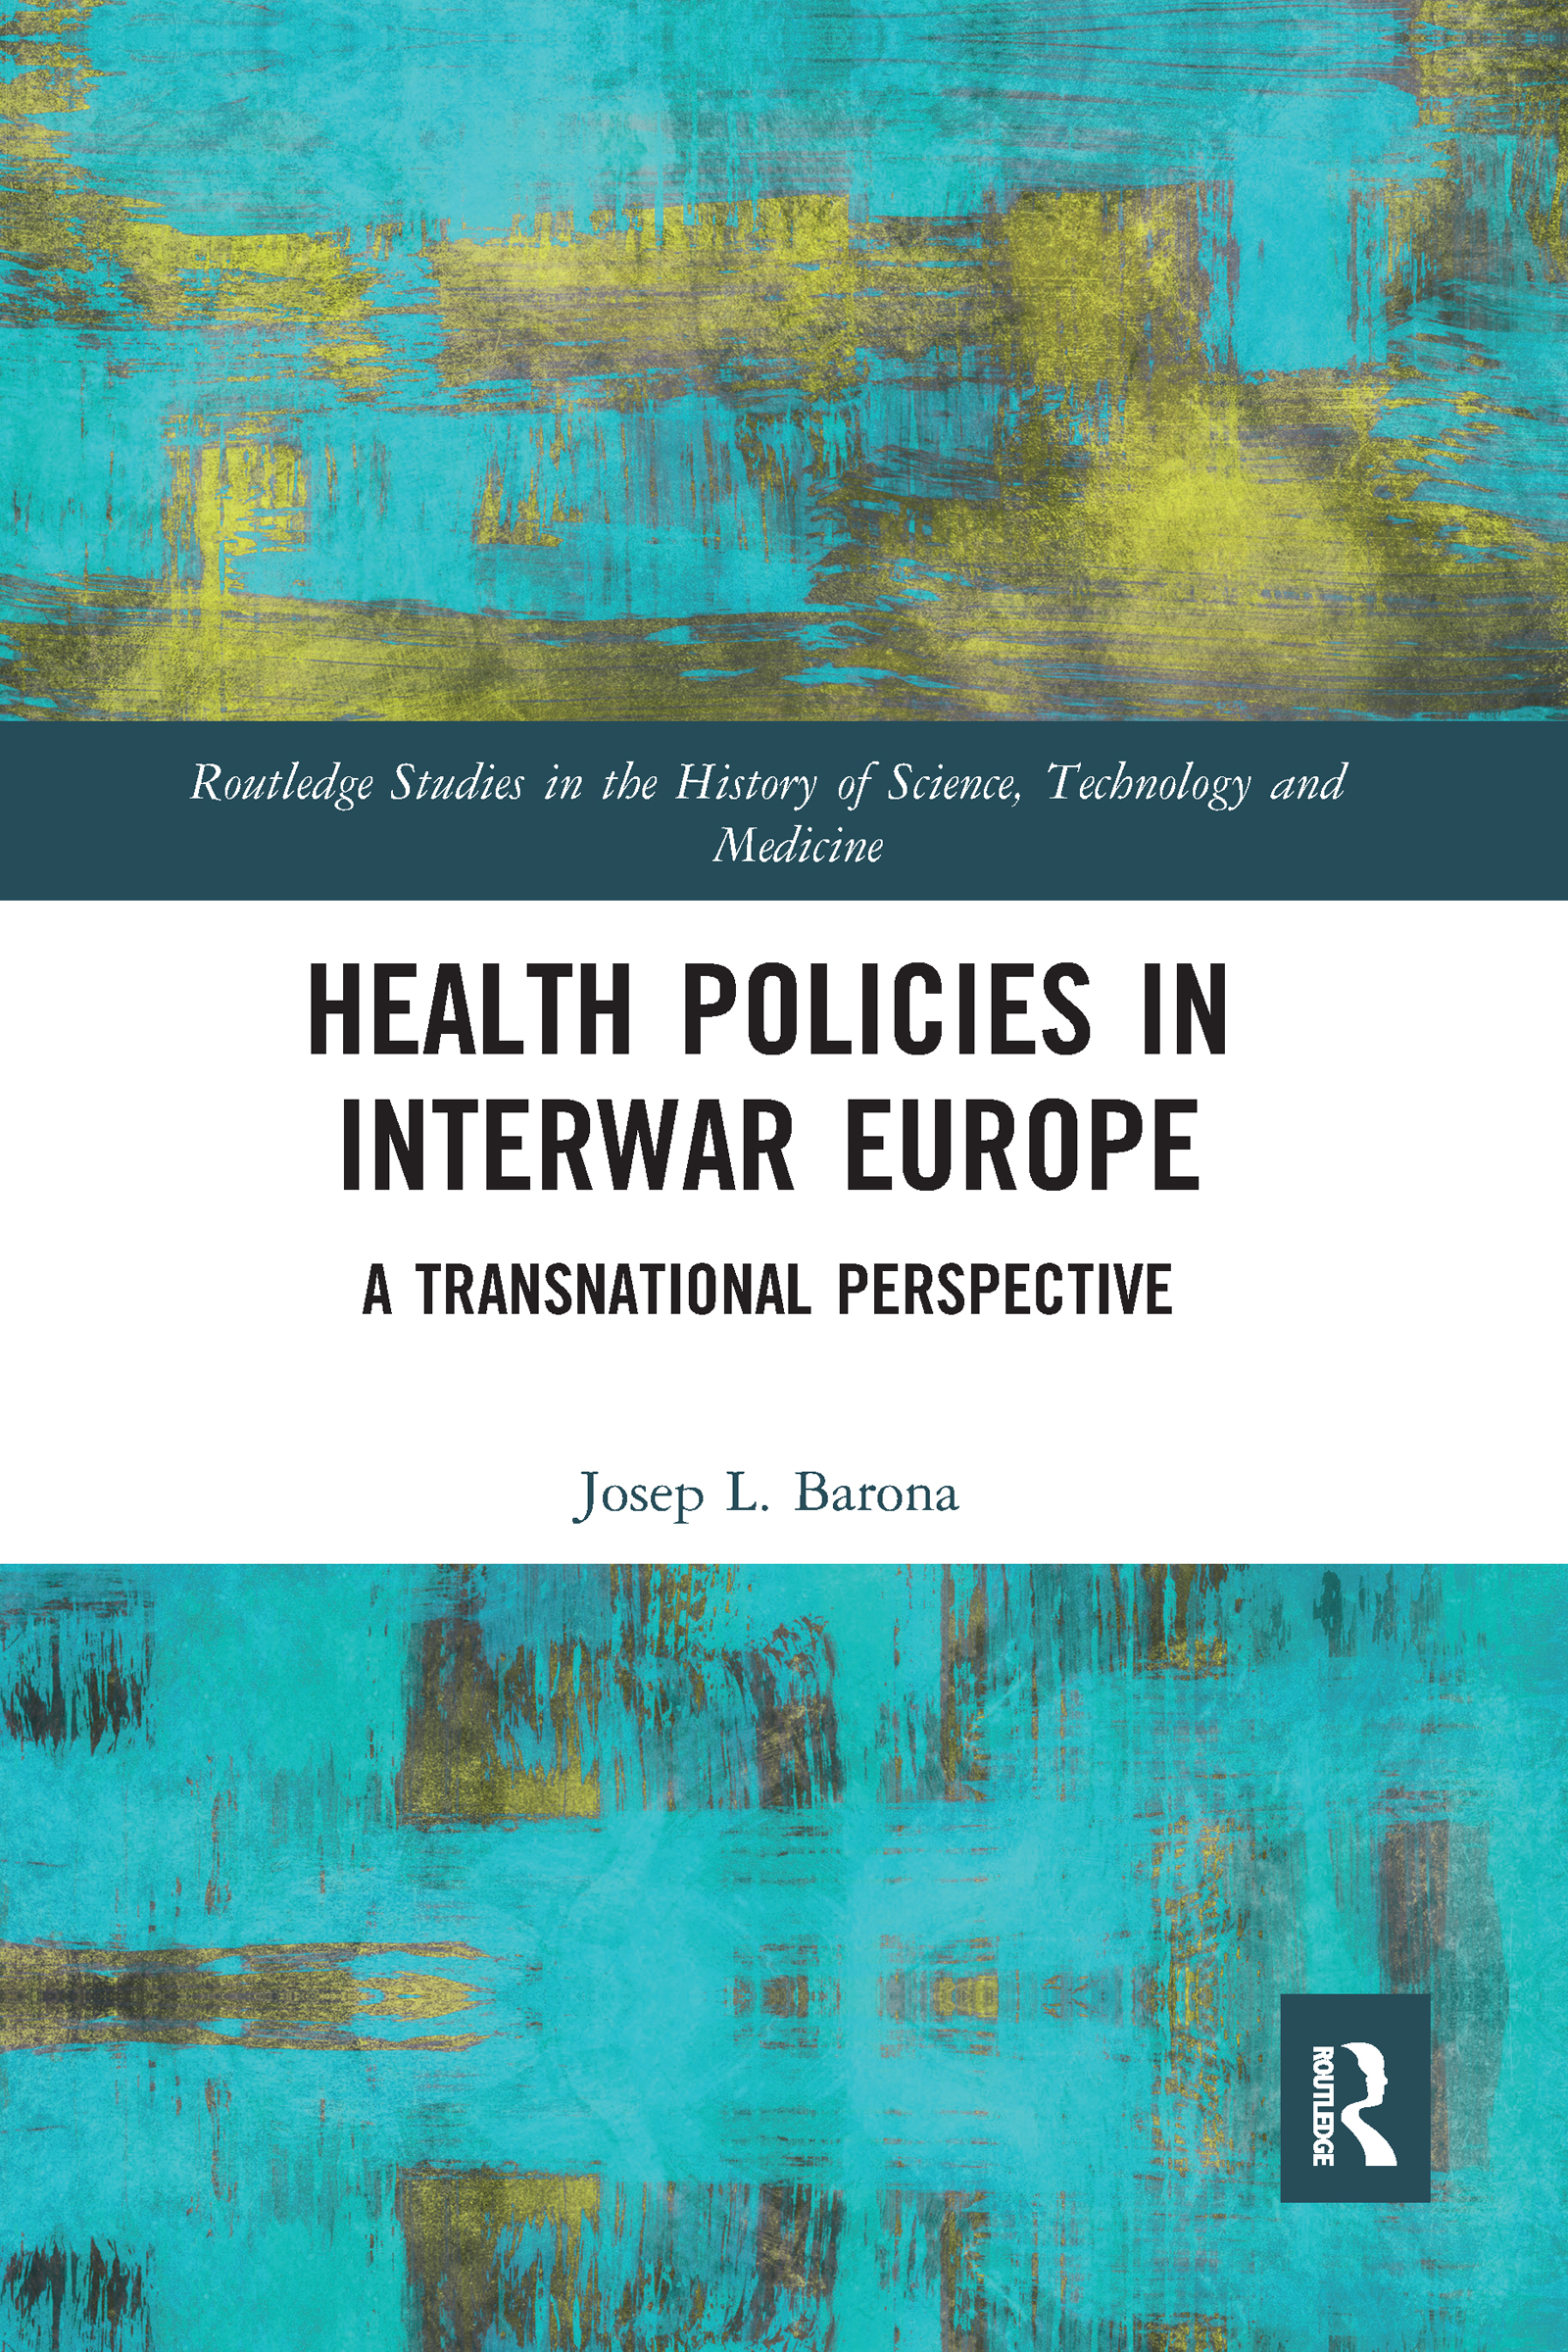 Health Policies in Interwar Europe